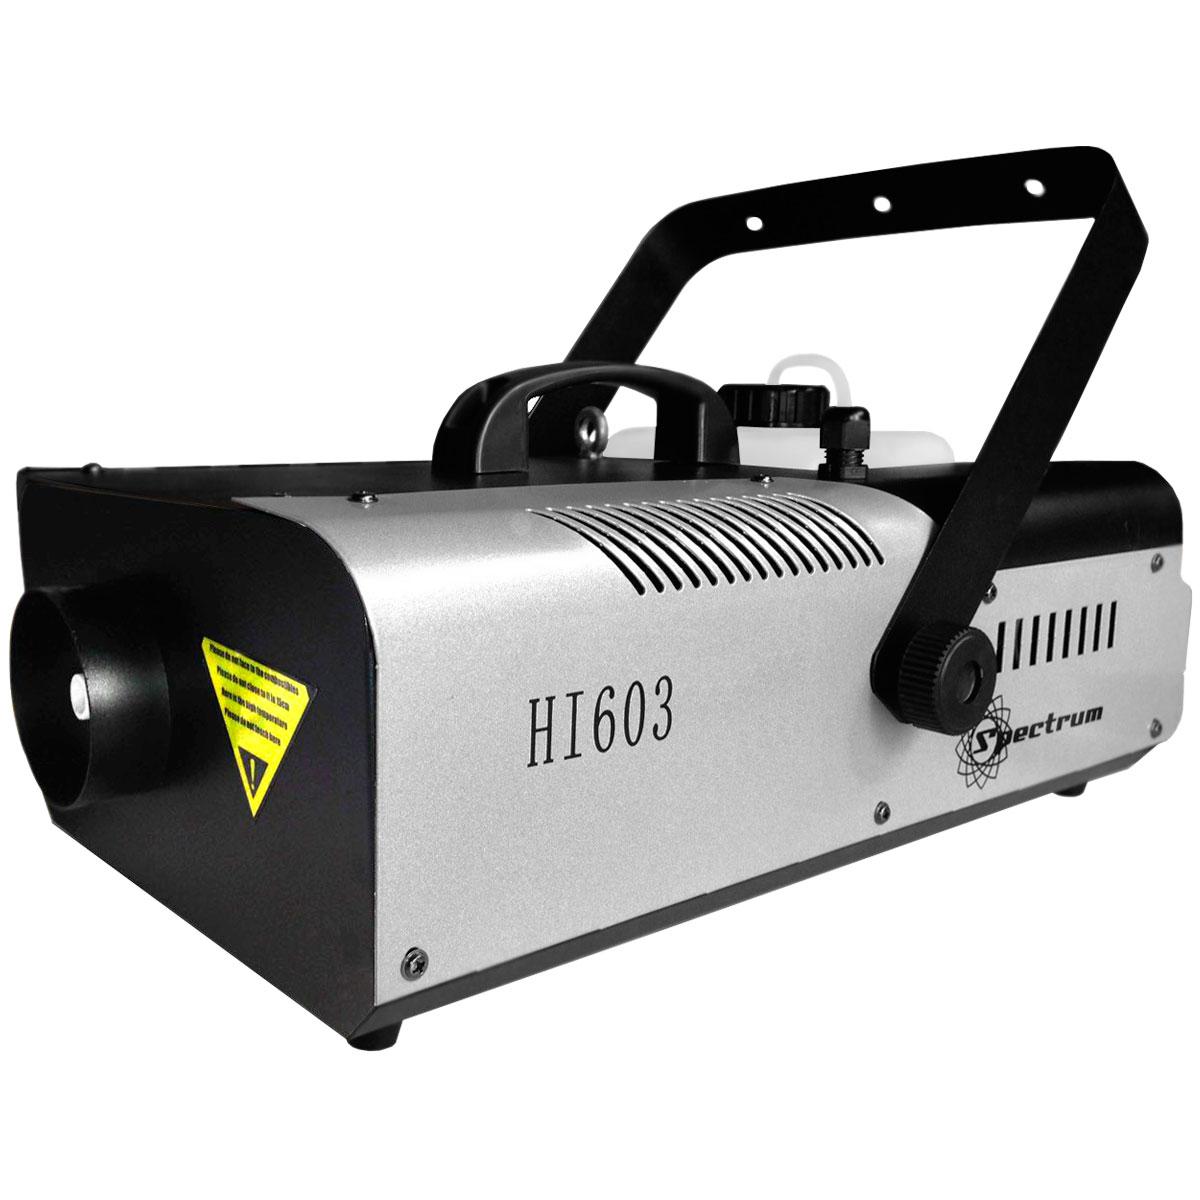 Máquina de Fumaça 1500W 220V c/ Controle Remoto HI-603 - Spectrum